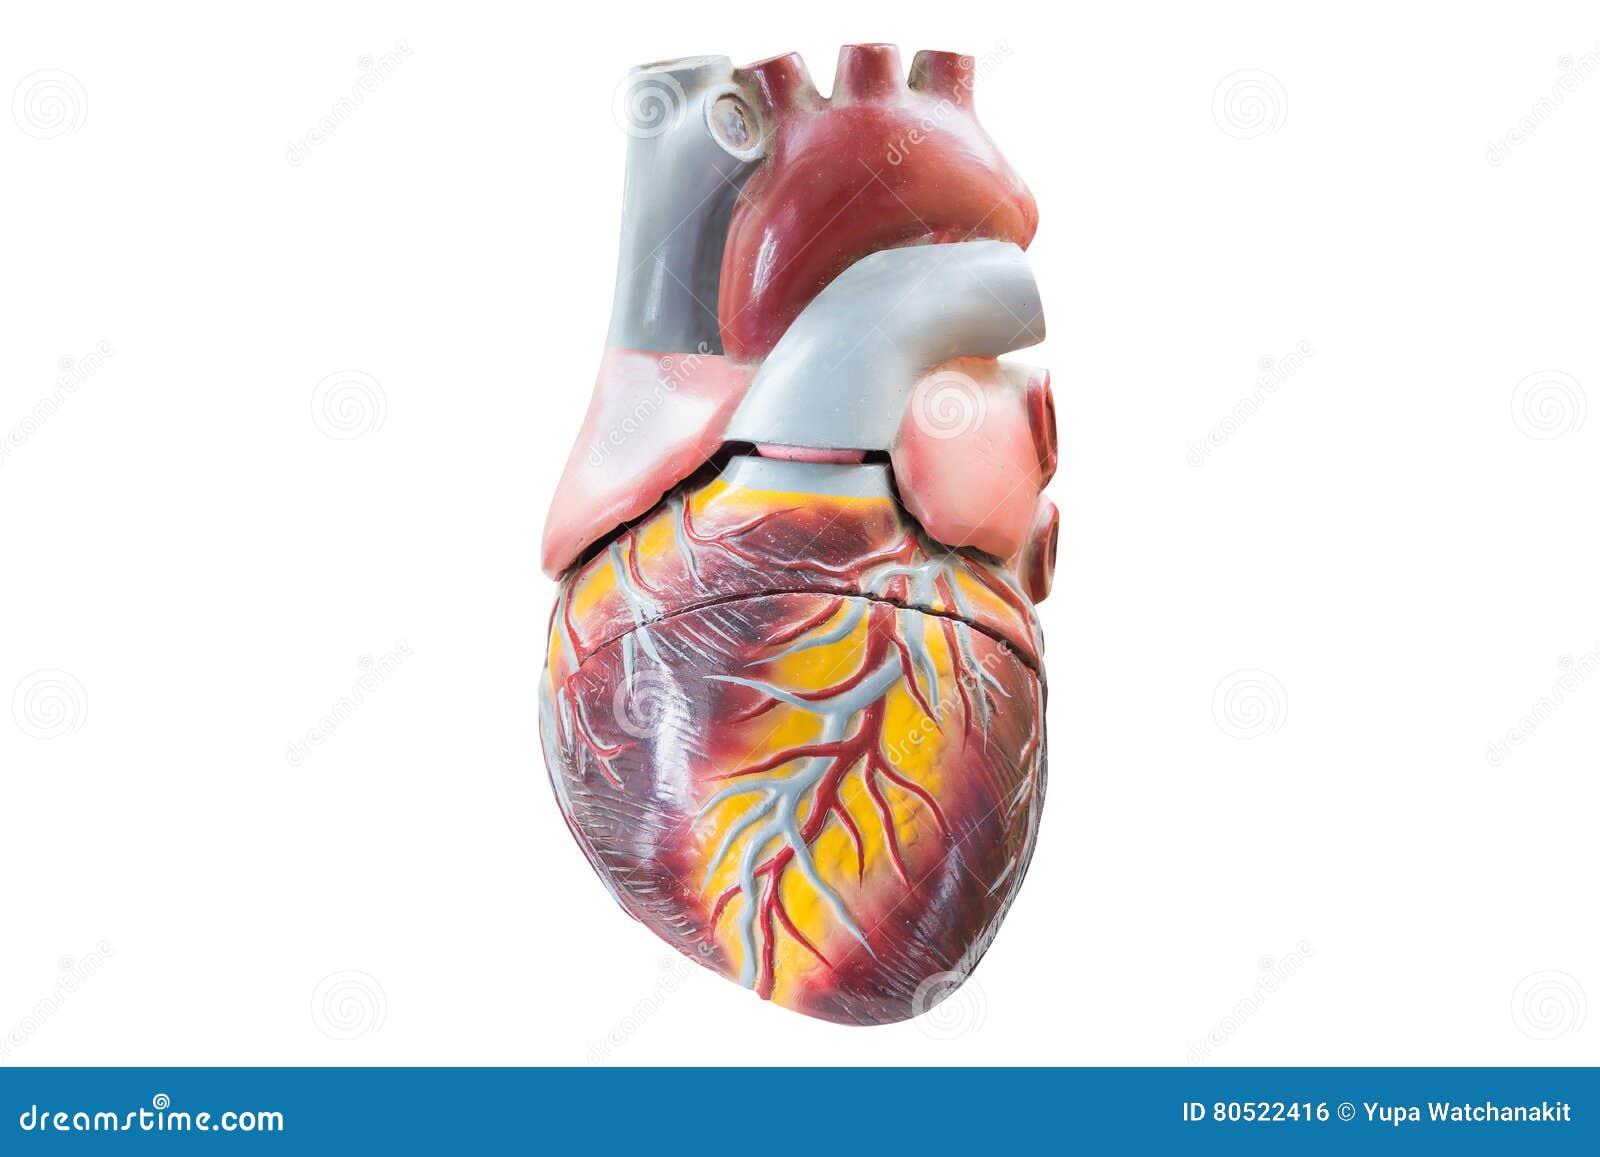 Artificial human heart model